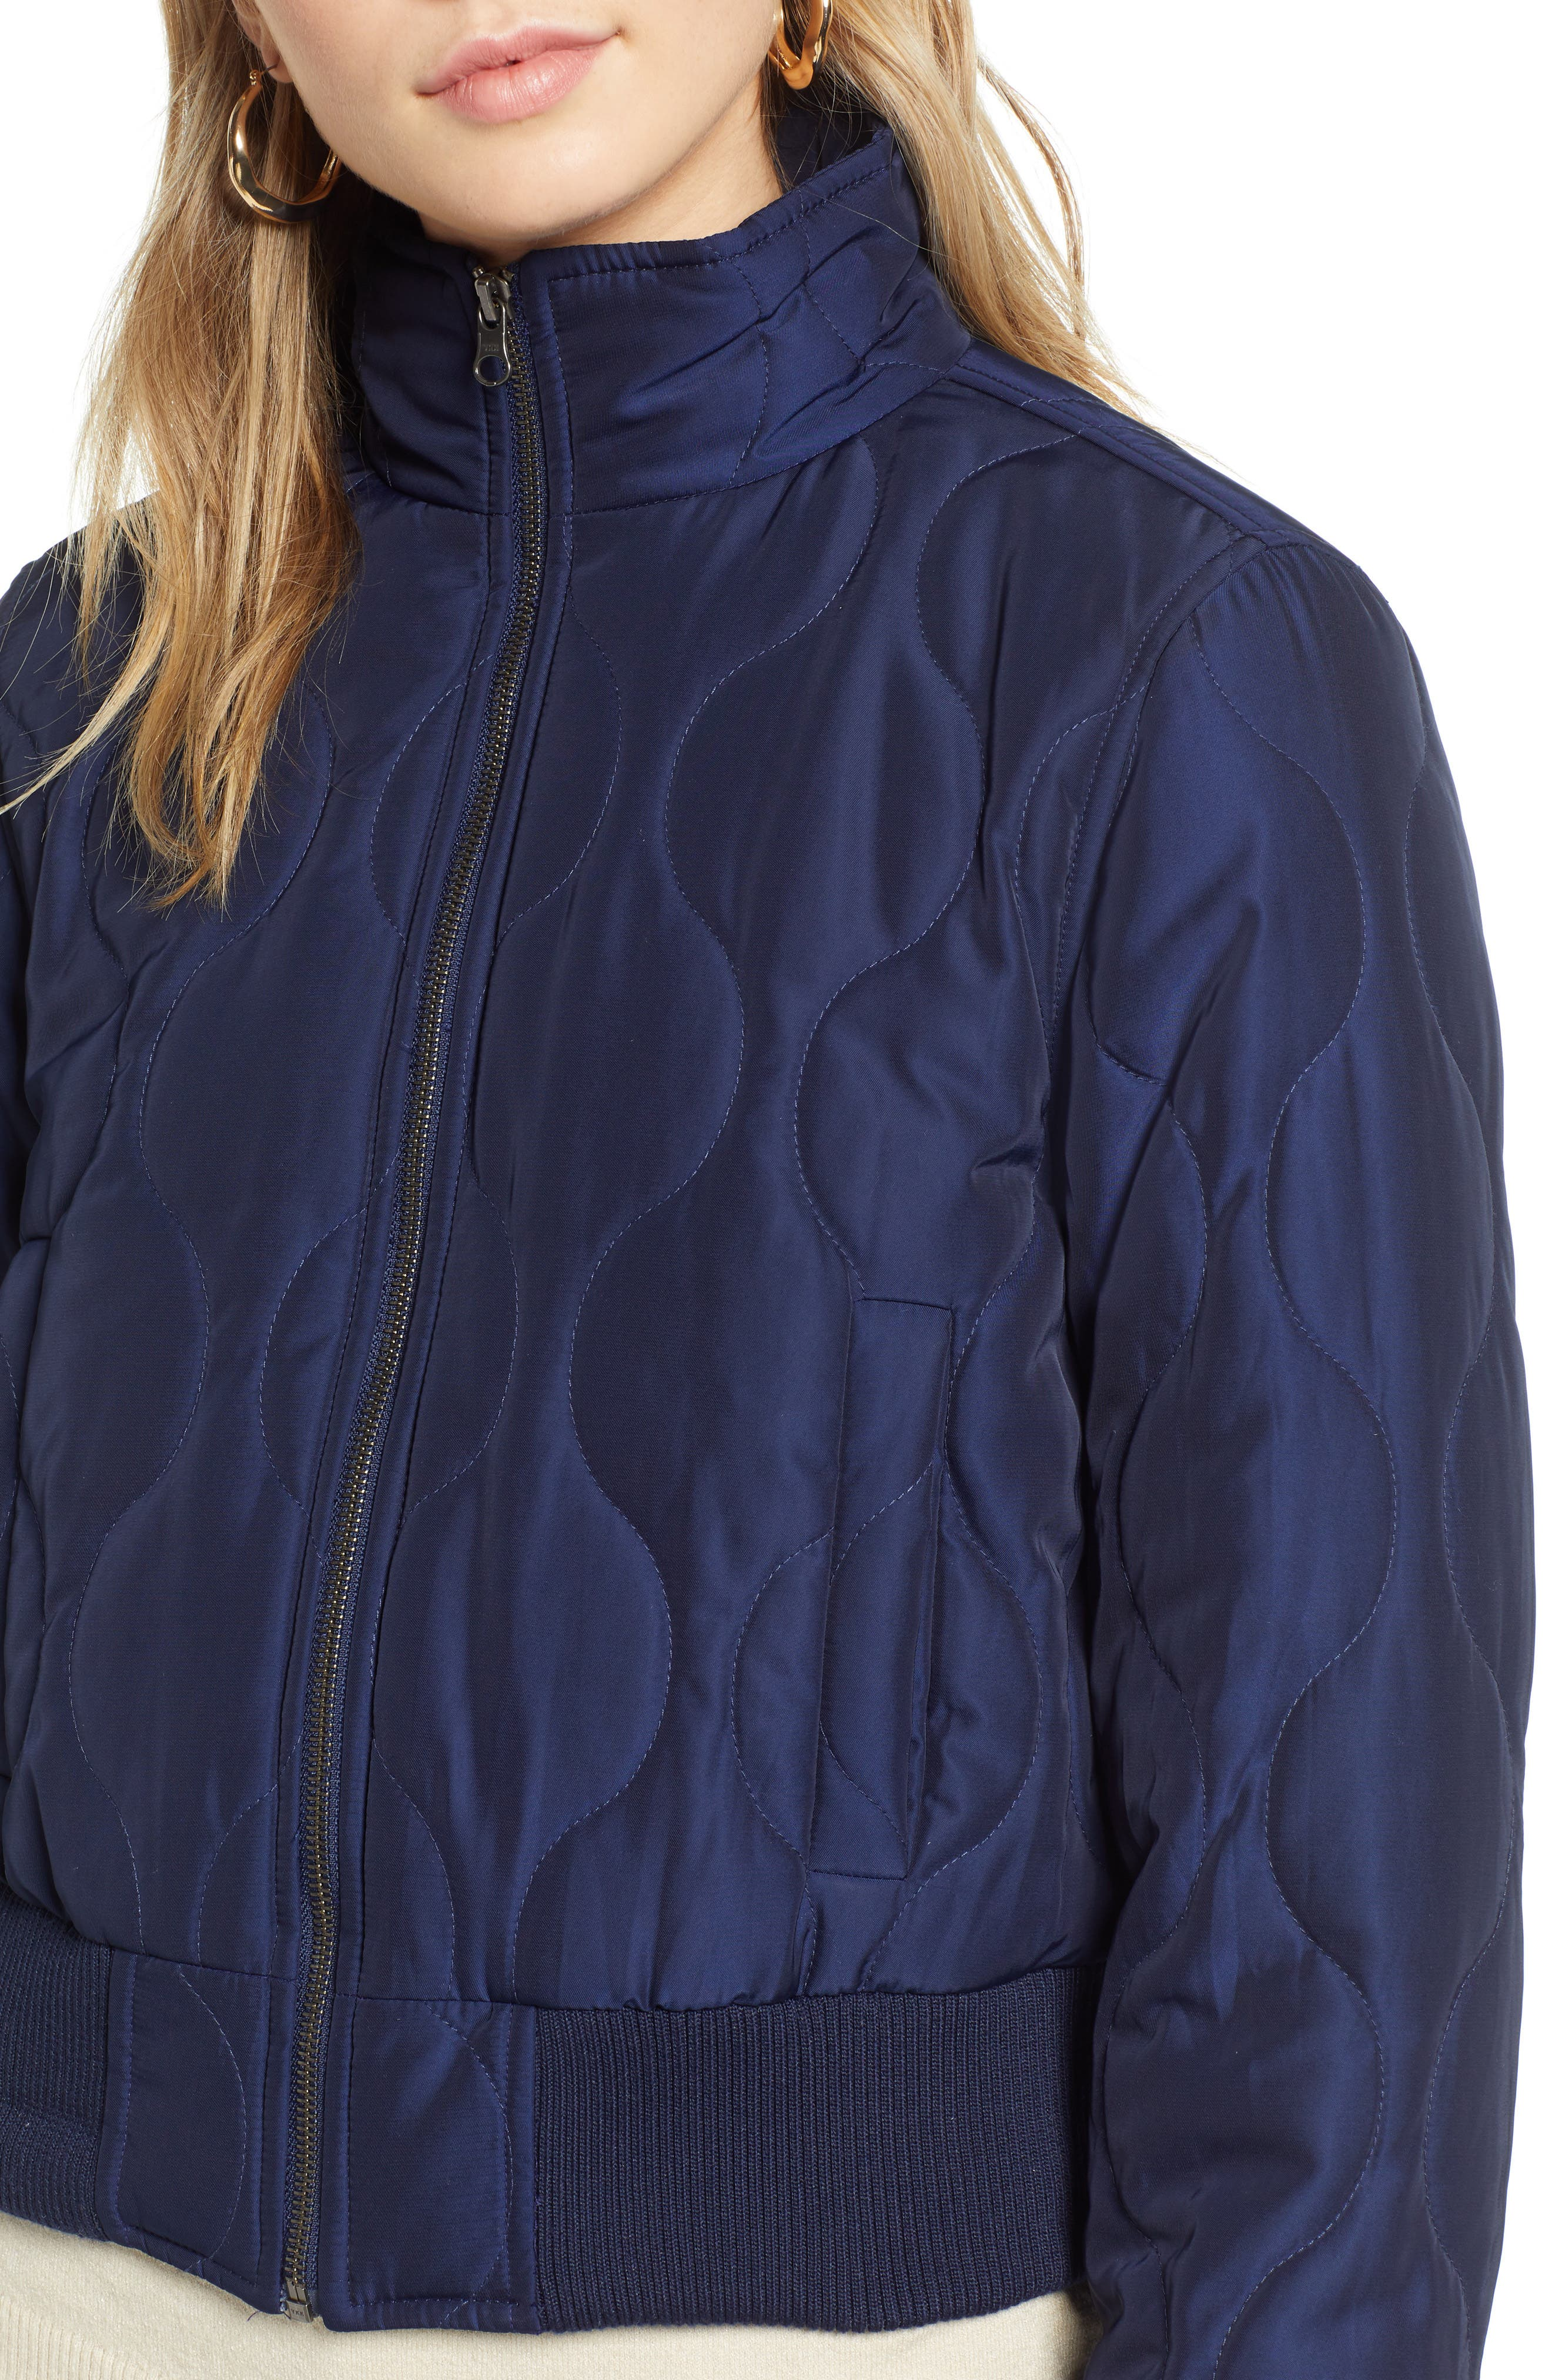 Satin Crop Puffer Jacket,                             Alternate thumbnail 4, color,                             NAVY MARITIME